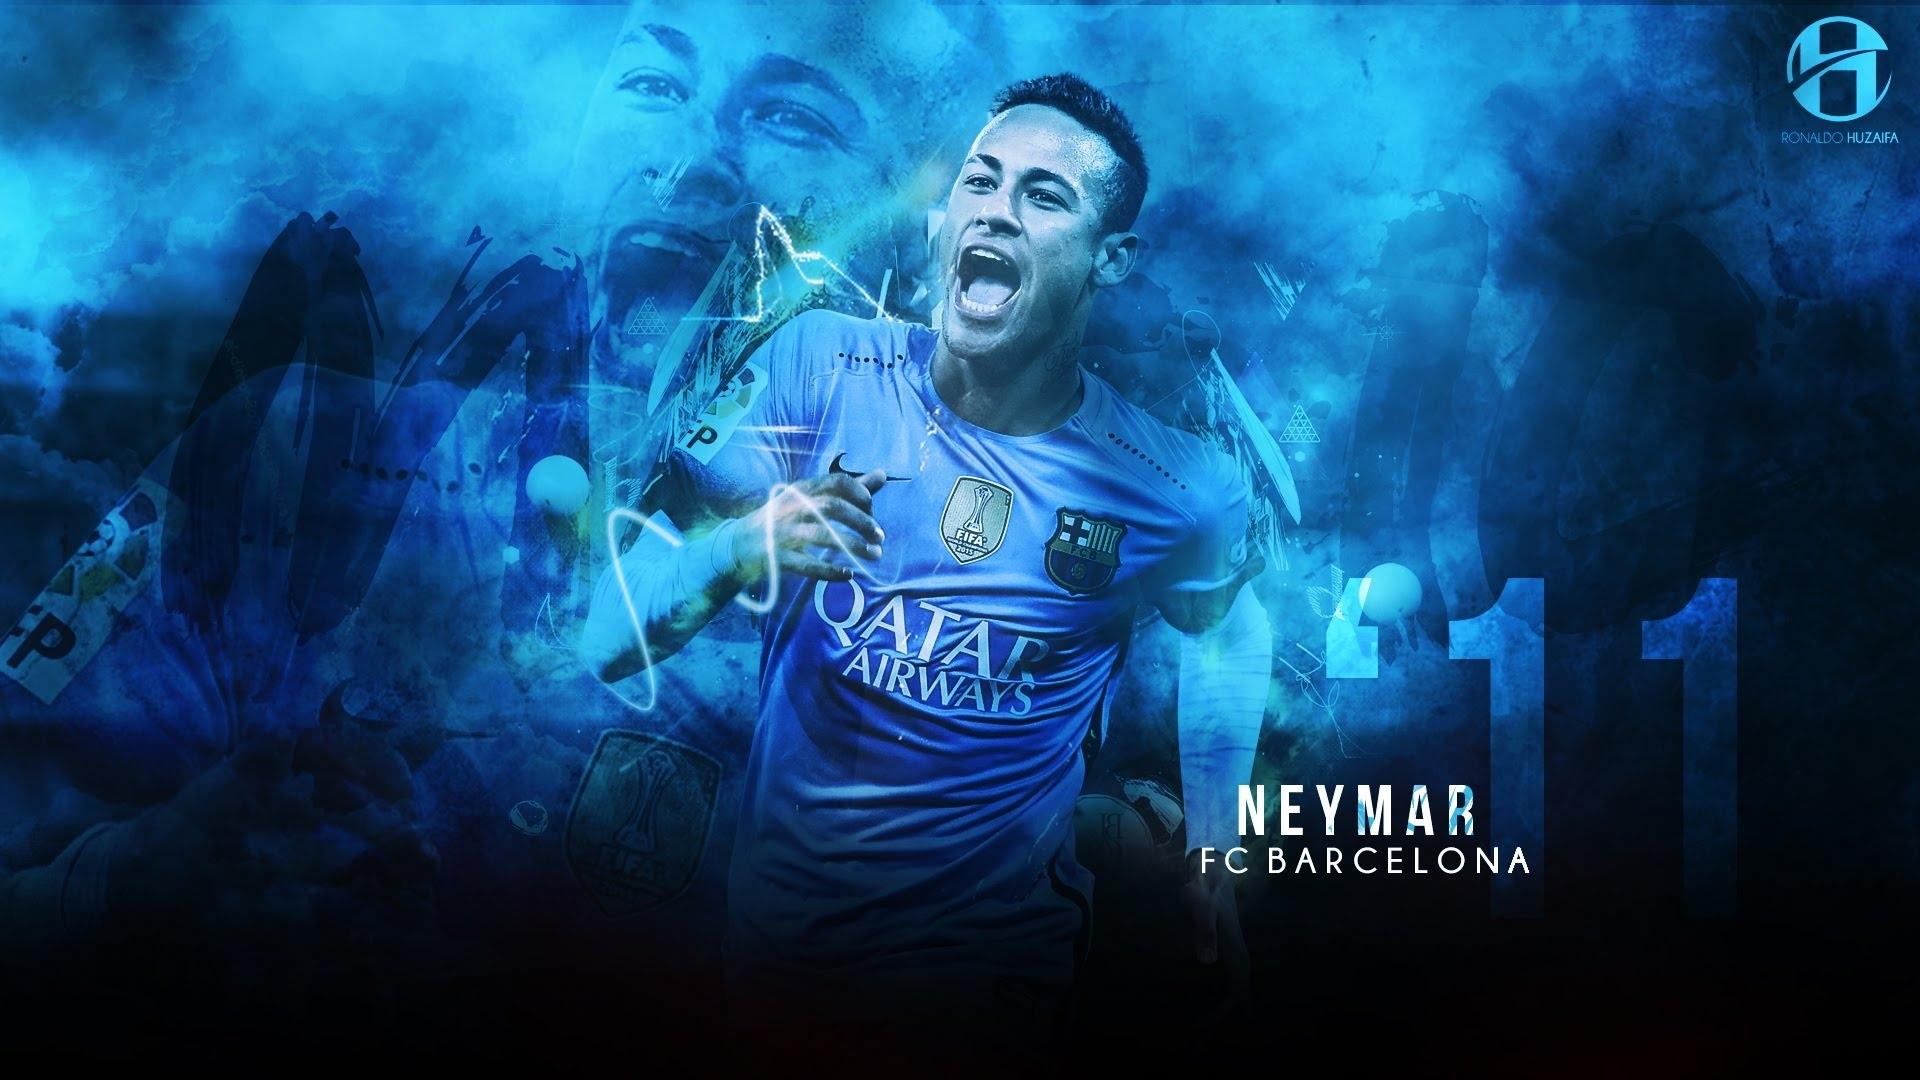 neymar jr. - best dribbling skills | 2016 | hd 1080i - youtube